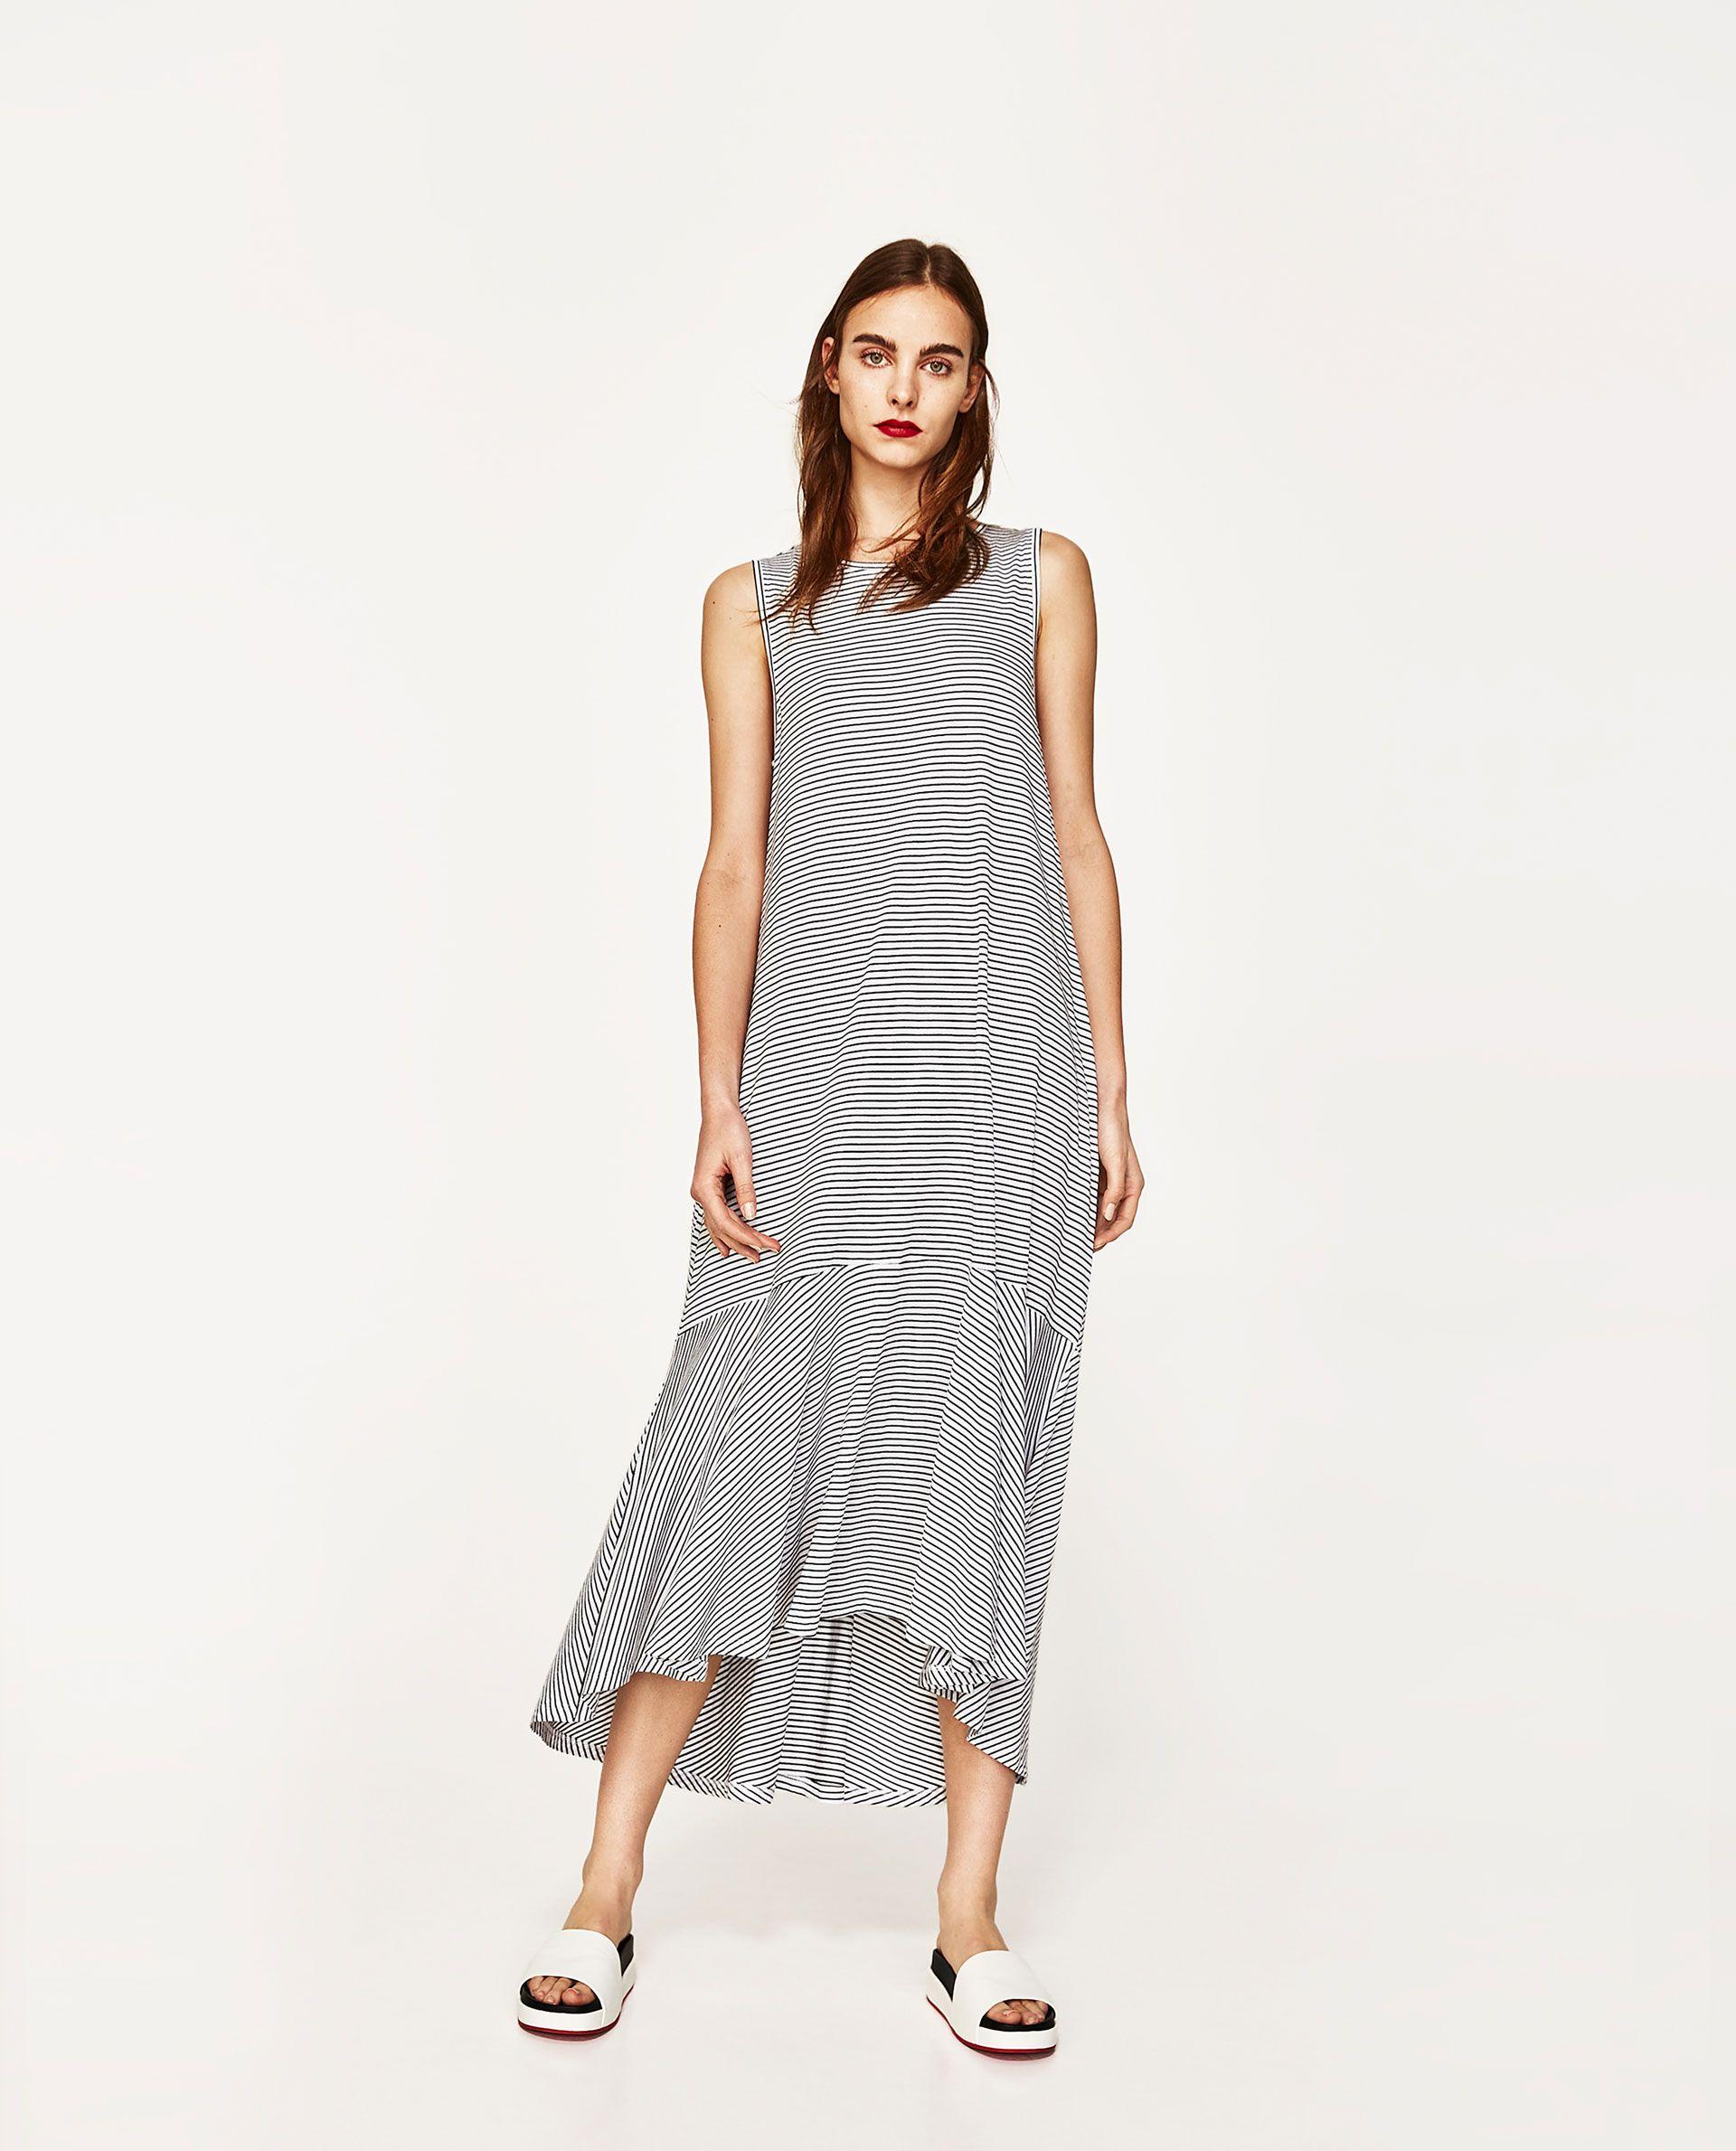 Zara Dress Long Woman Ruffled Hem With qn08r0wv6x